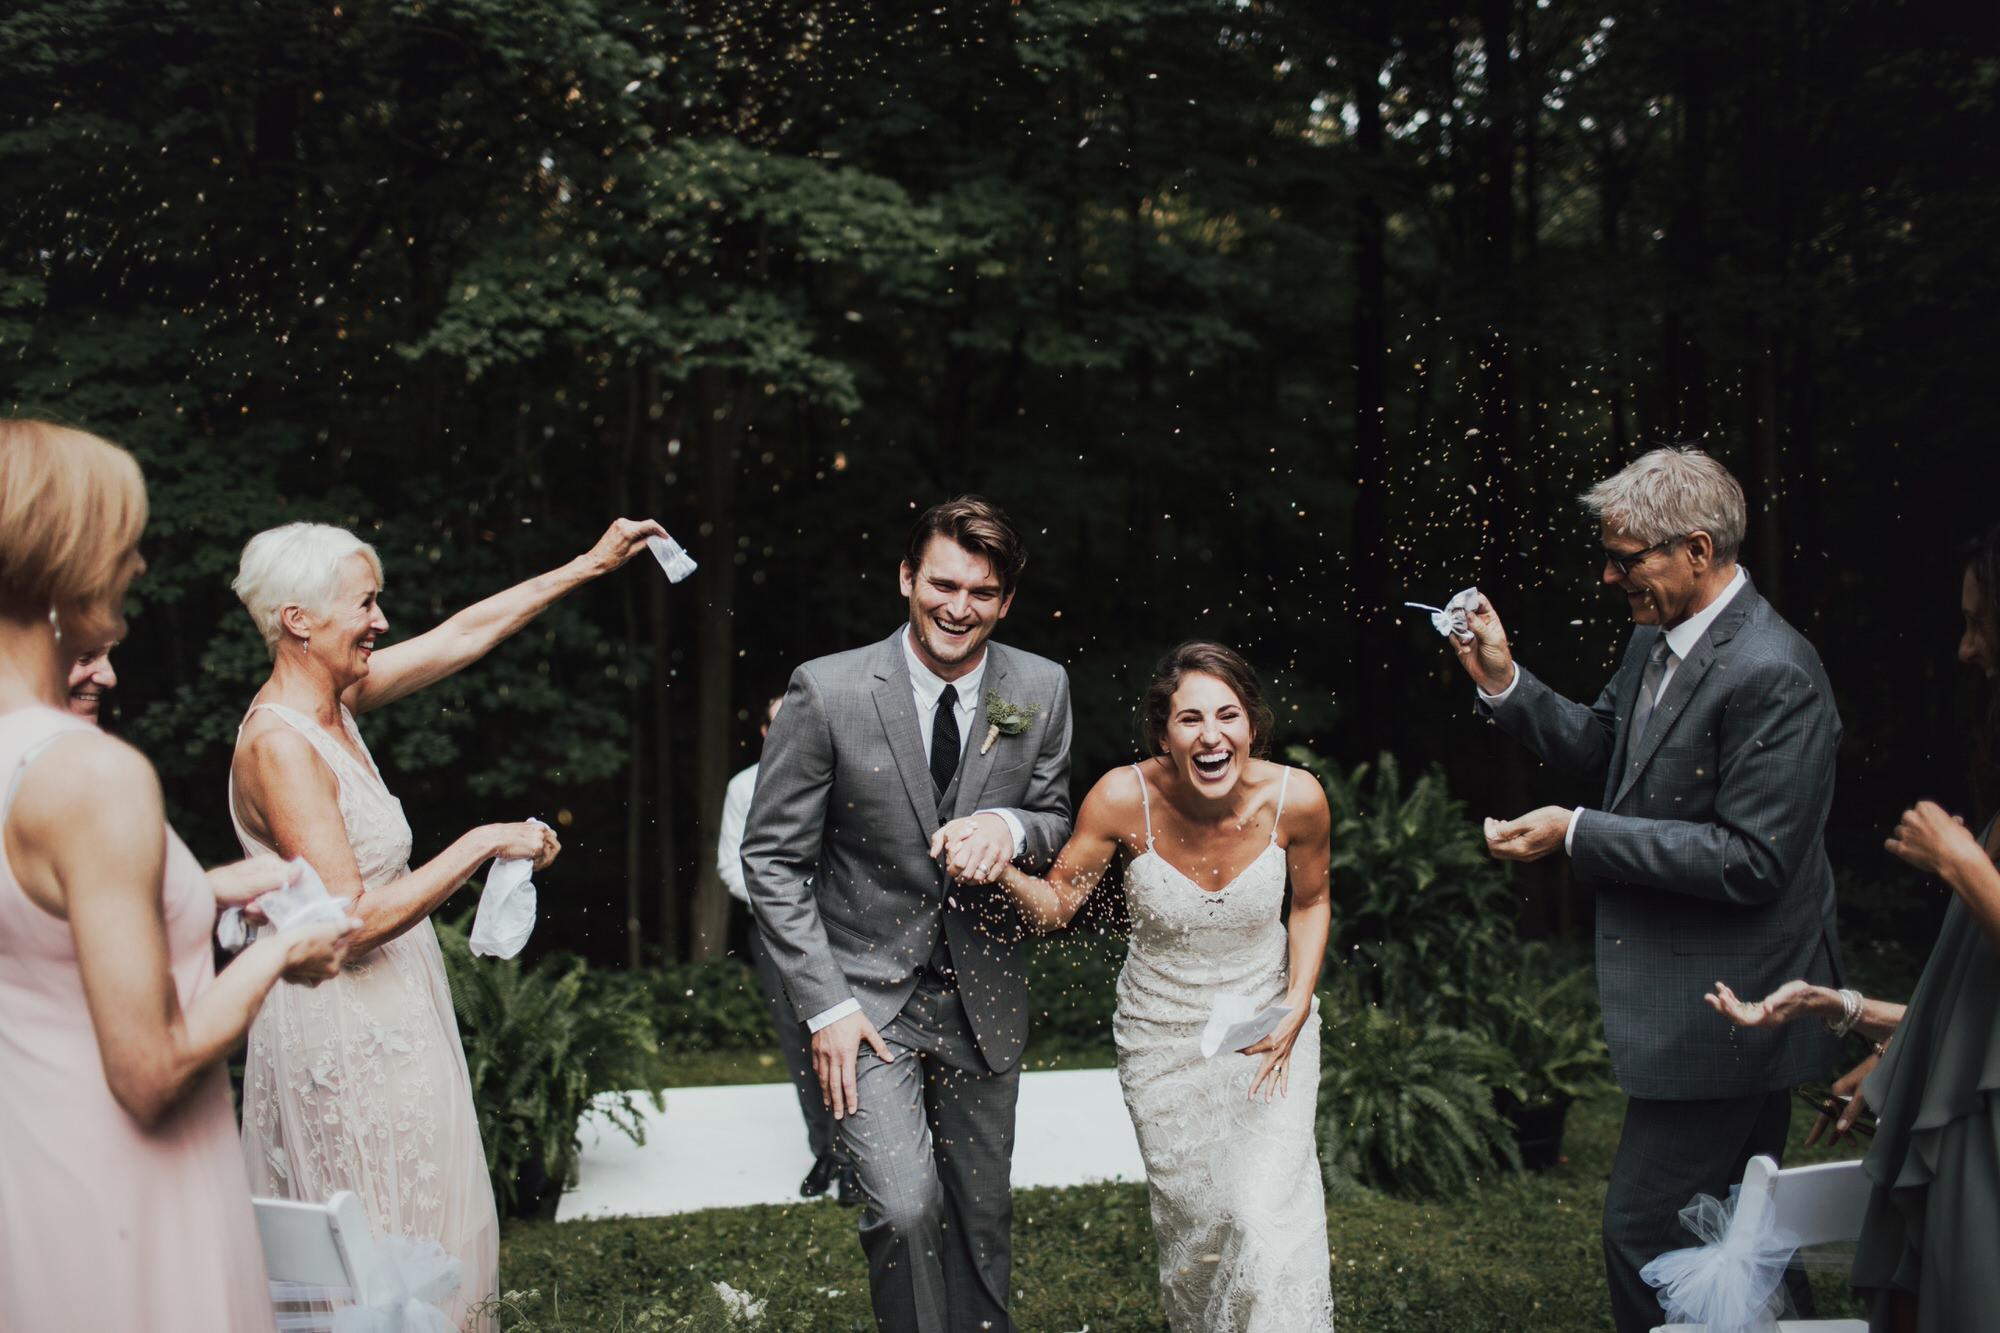 emily-aaron-rochester-new-york-wedding-photographer-78.JPG